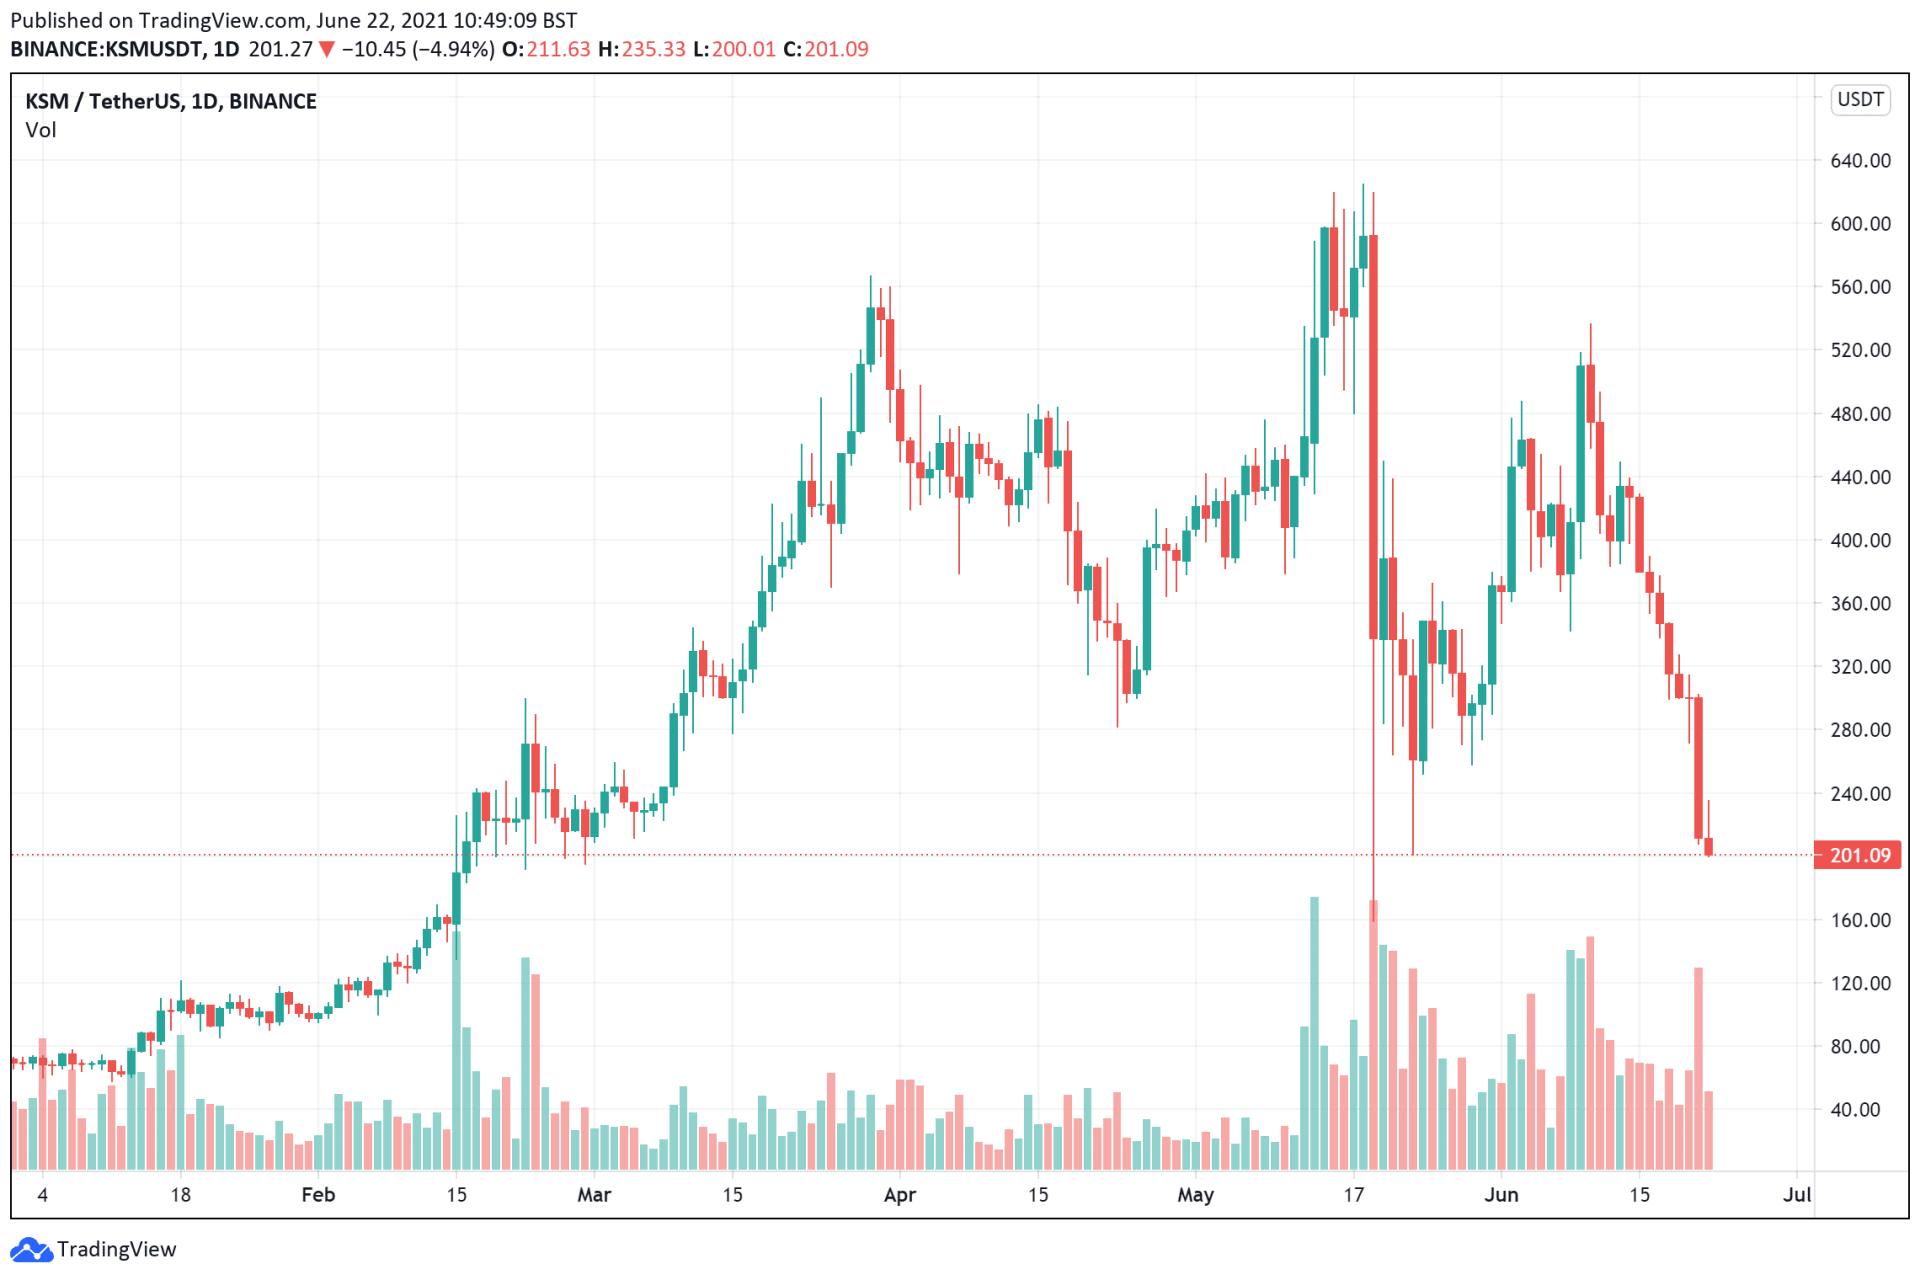 Kusama price charts for June 22 - buy cryptocurrencies